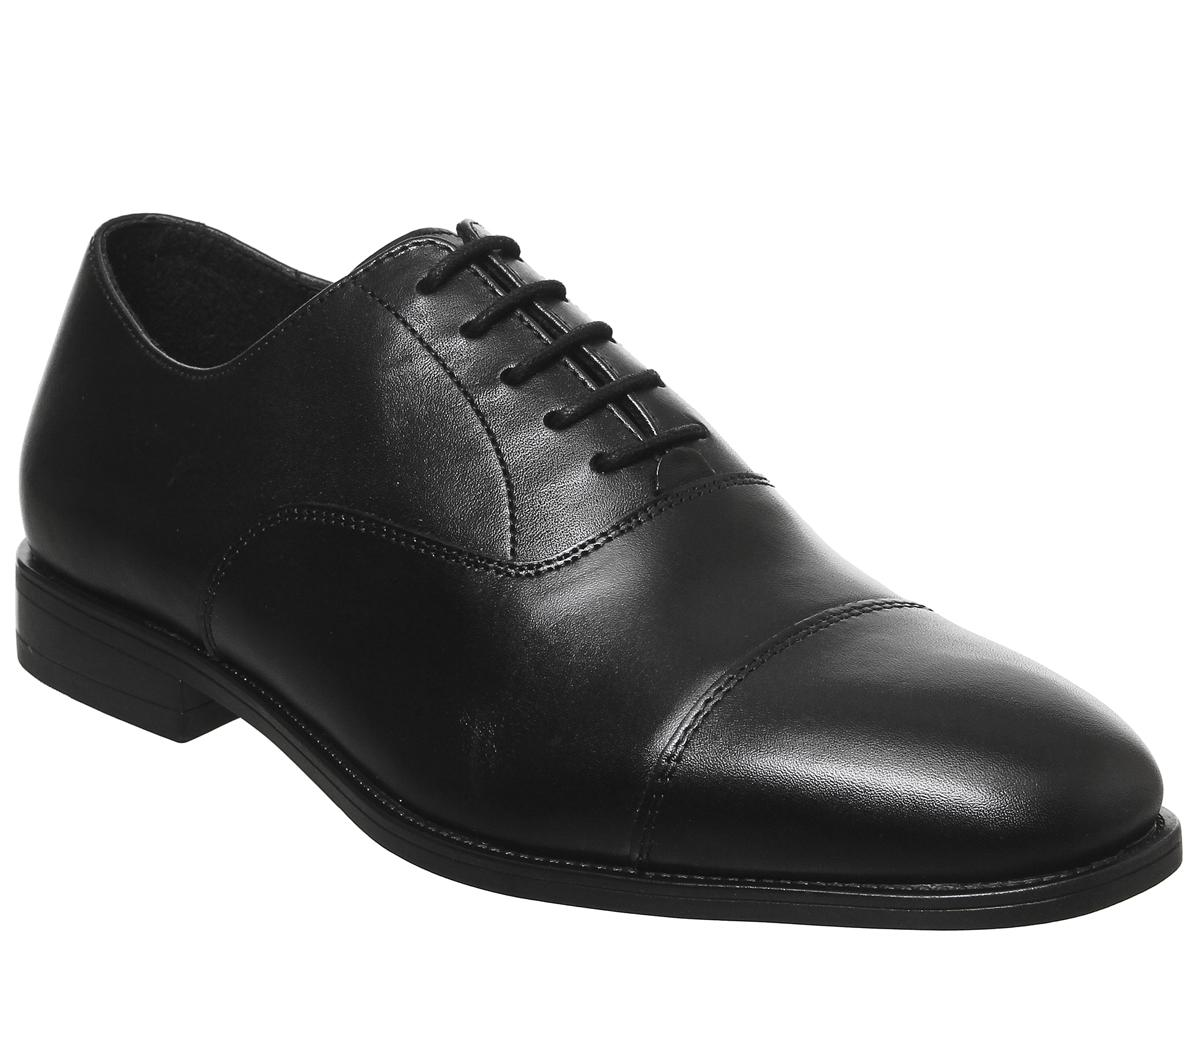 Memo Oxford Smart Shoes